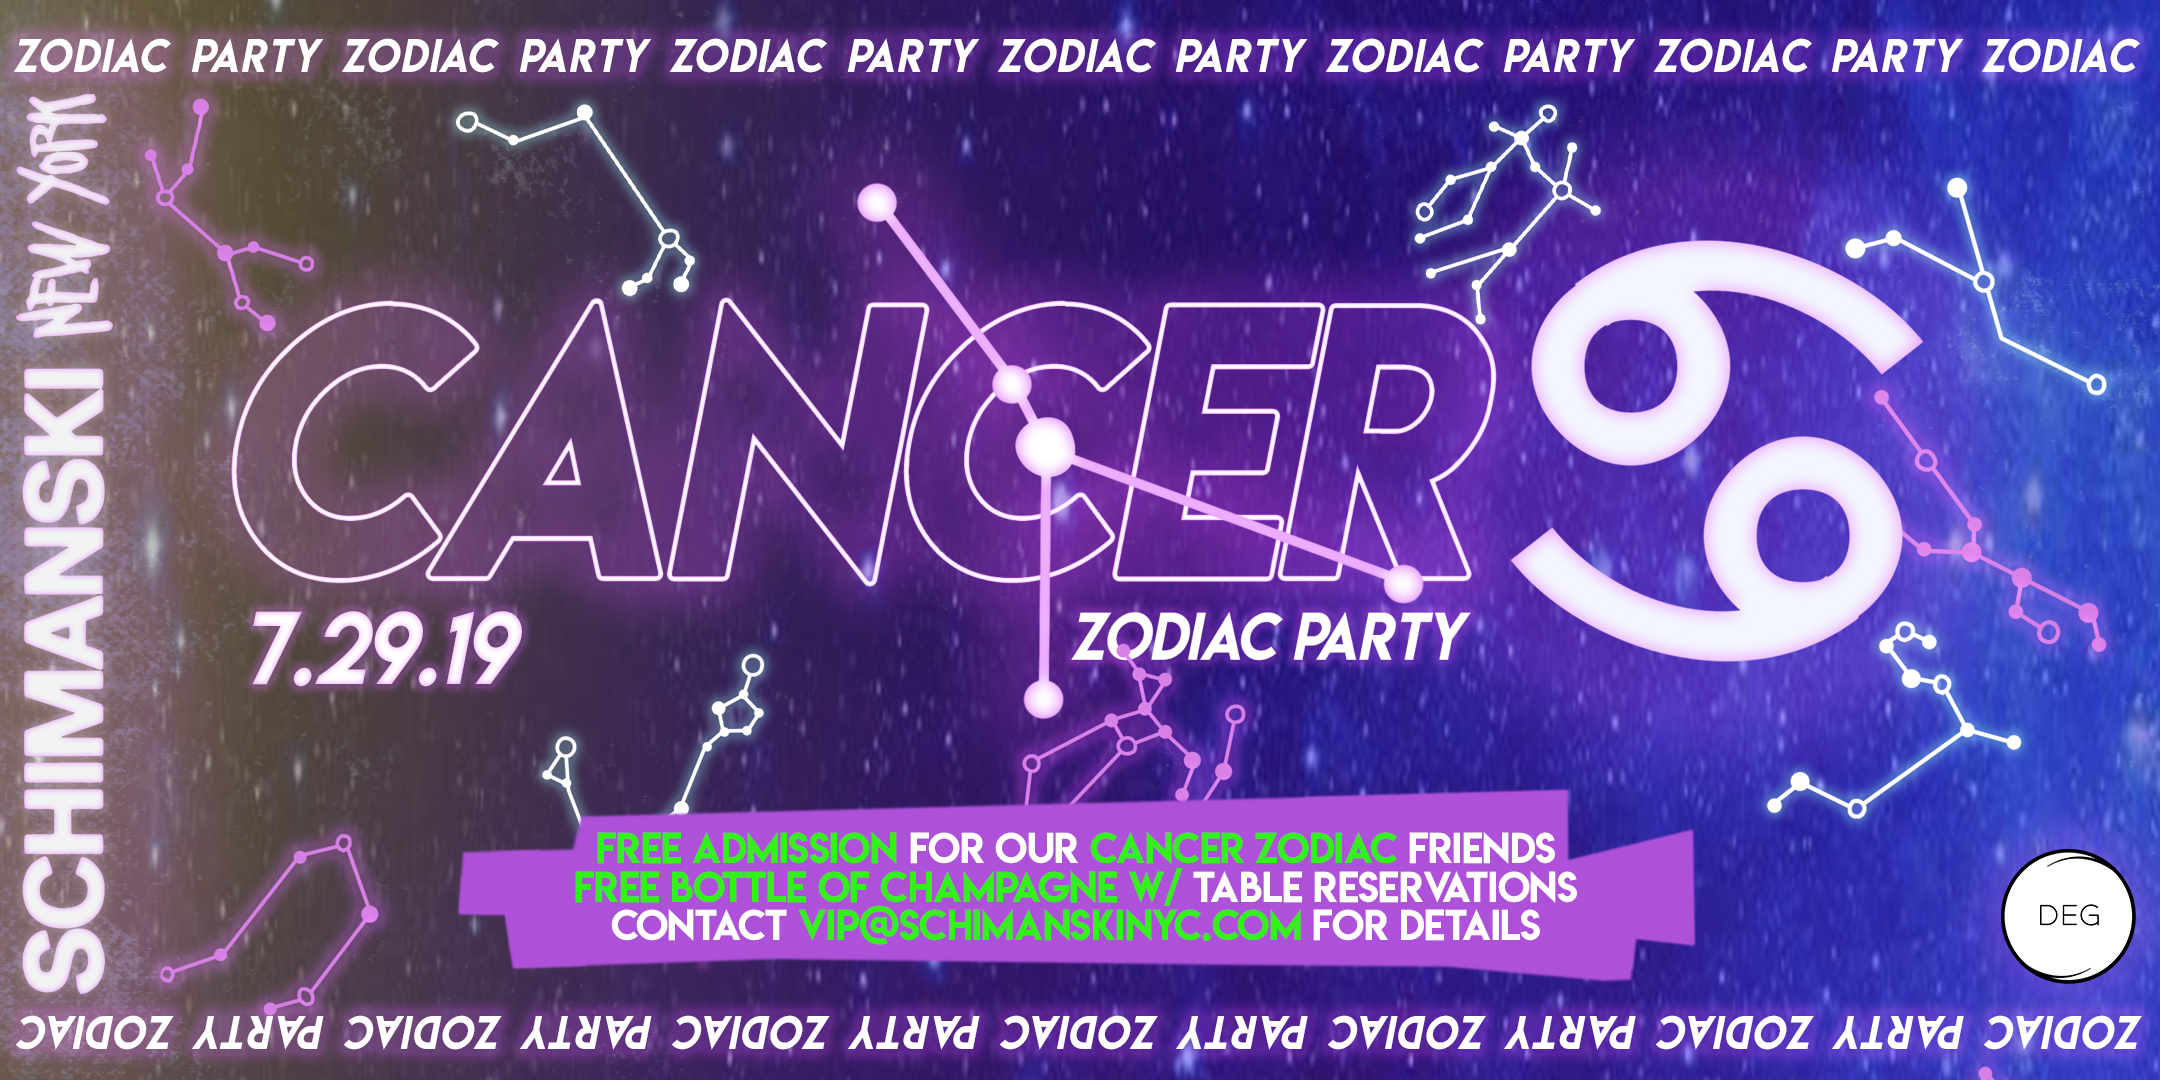 Zodiac Party July Cancer.jpg